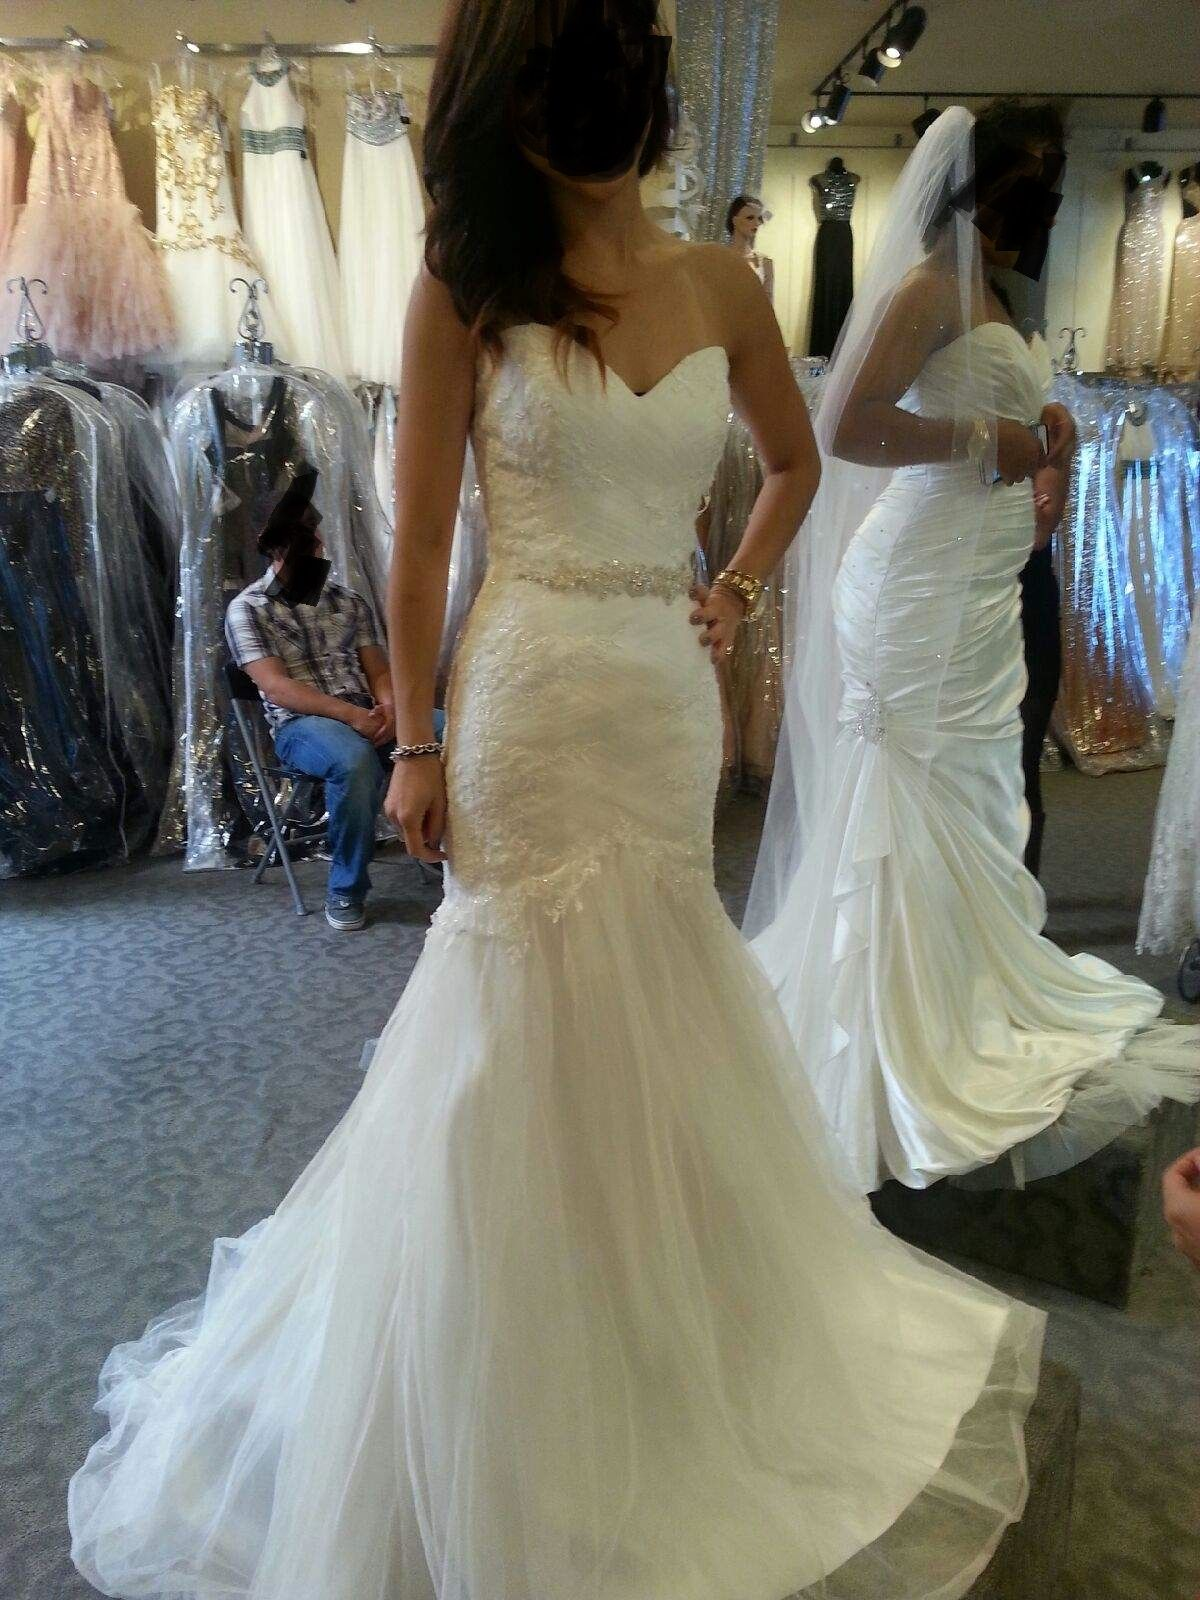 Mermaid Bridal Gown Bridal Gowns Mermaid Petite Wedding Dress Pretty Wedding Dresses [ 1170 x 937 Pixel ]